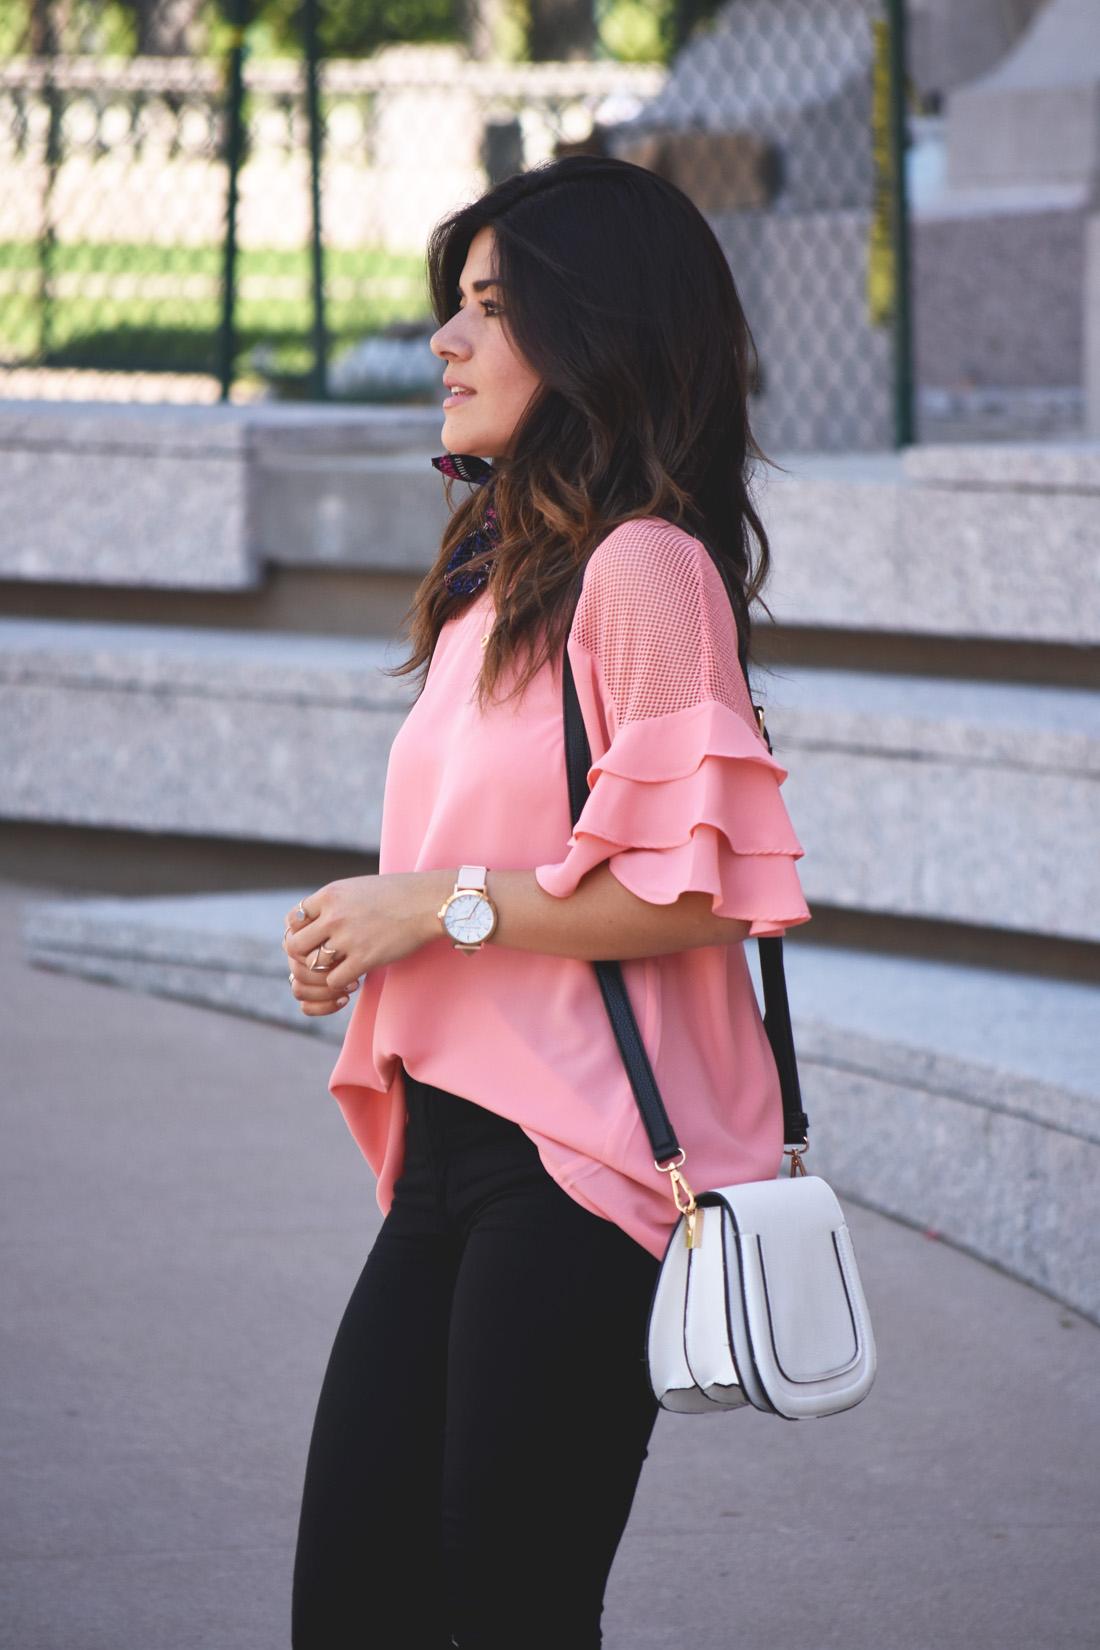 Carolina Hellal of Chic Talk wearing a VIPme pink top, Christian Paul watch, and solesociety bag.